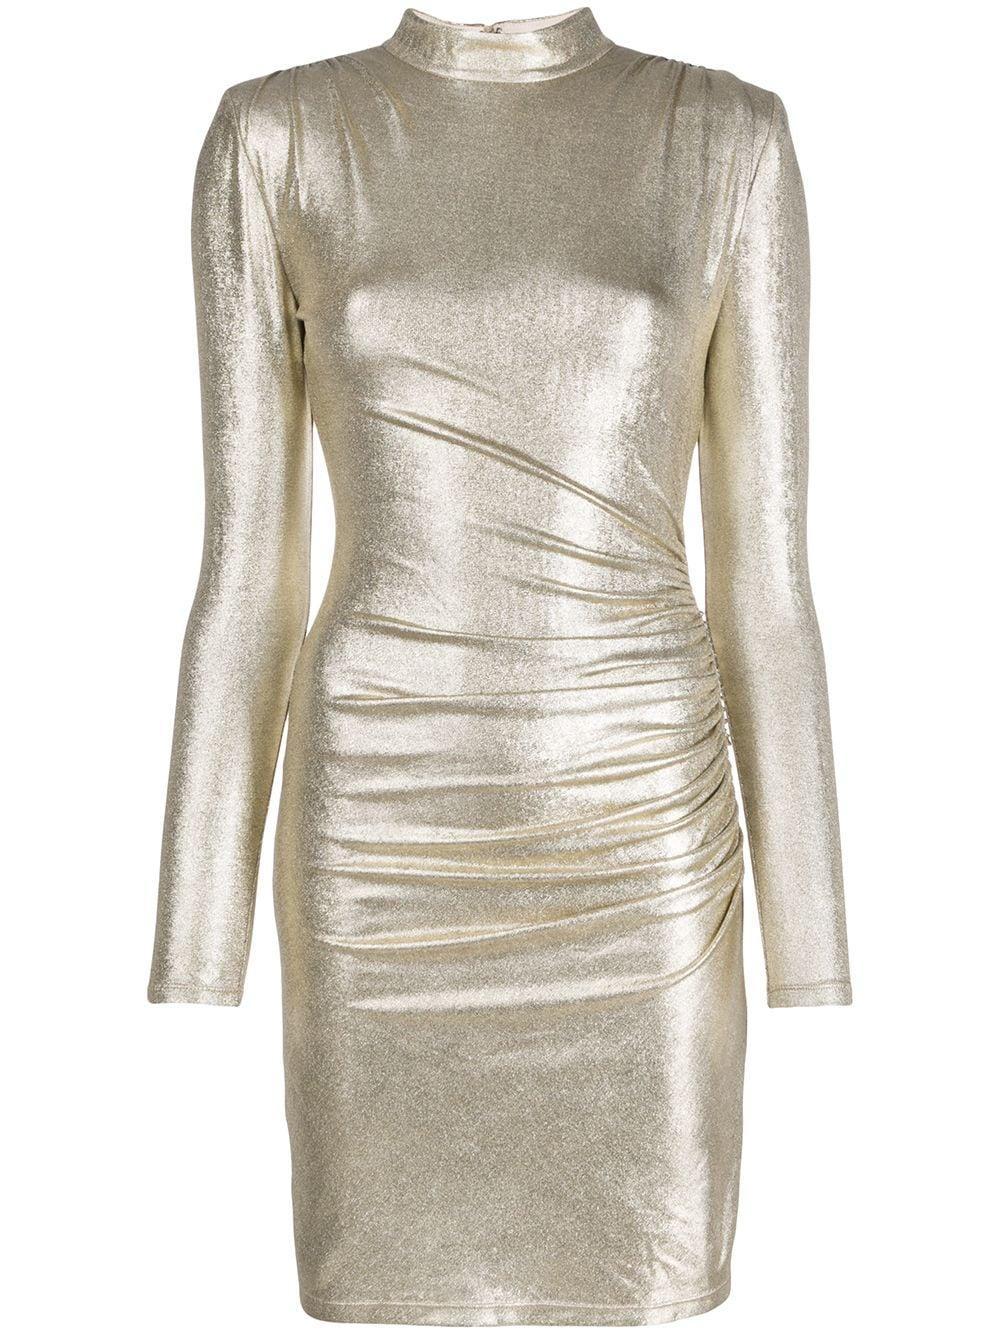 Hilary Ruched Mock Neck Dress Item # CC912M10523